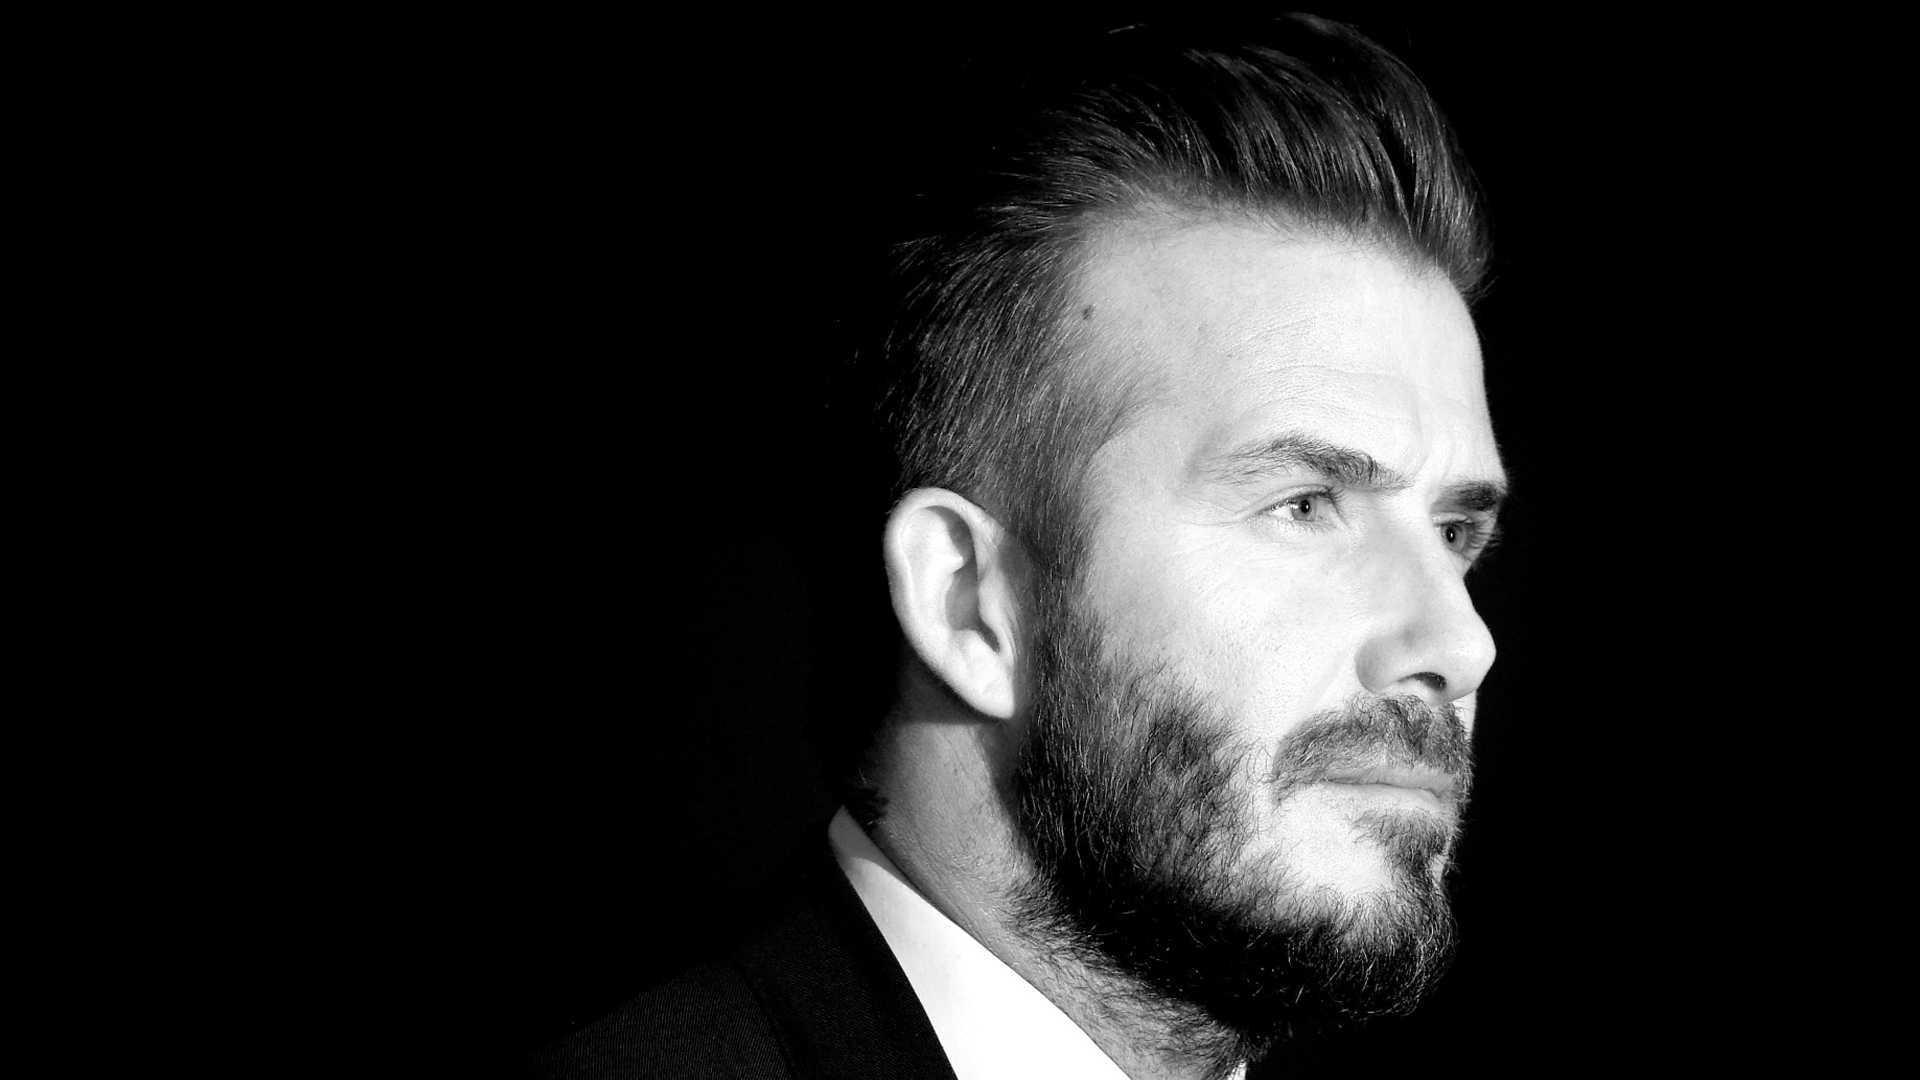 Monochrome David Beckham Wallpaper 53242